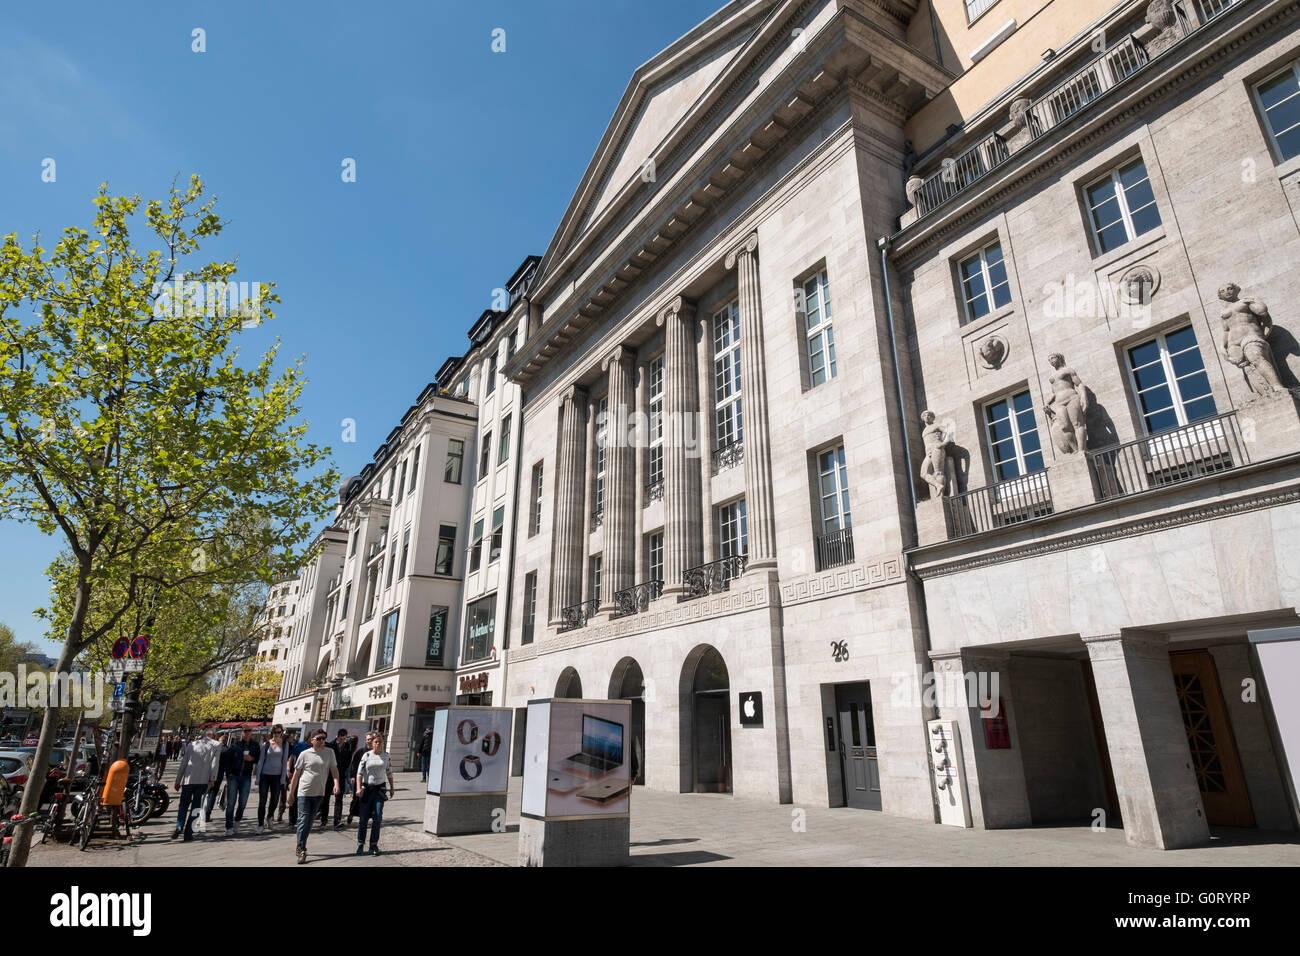 Apple Store Germany Stockfotos & Apple Store Germany Bilder - Seite ...